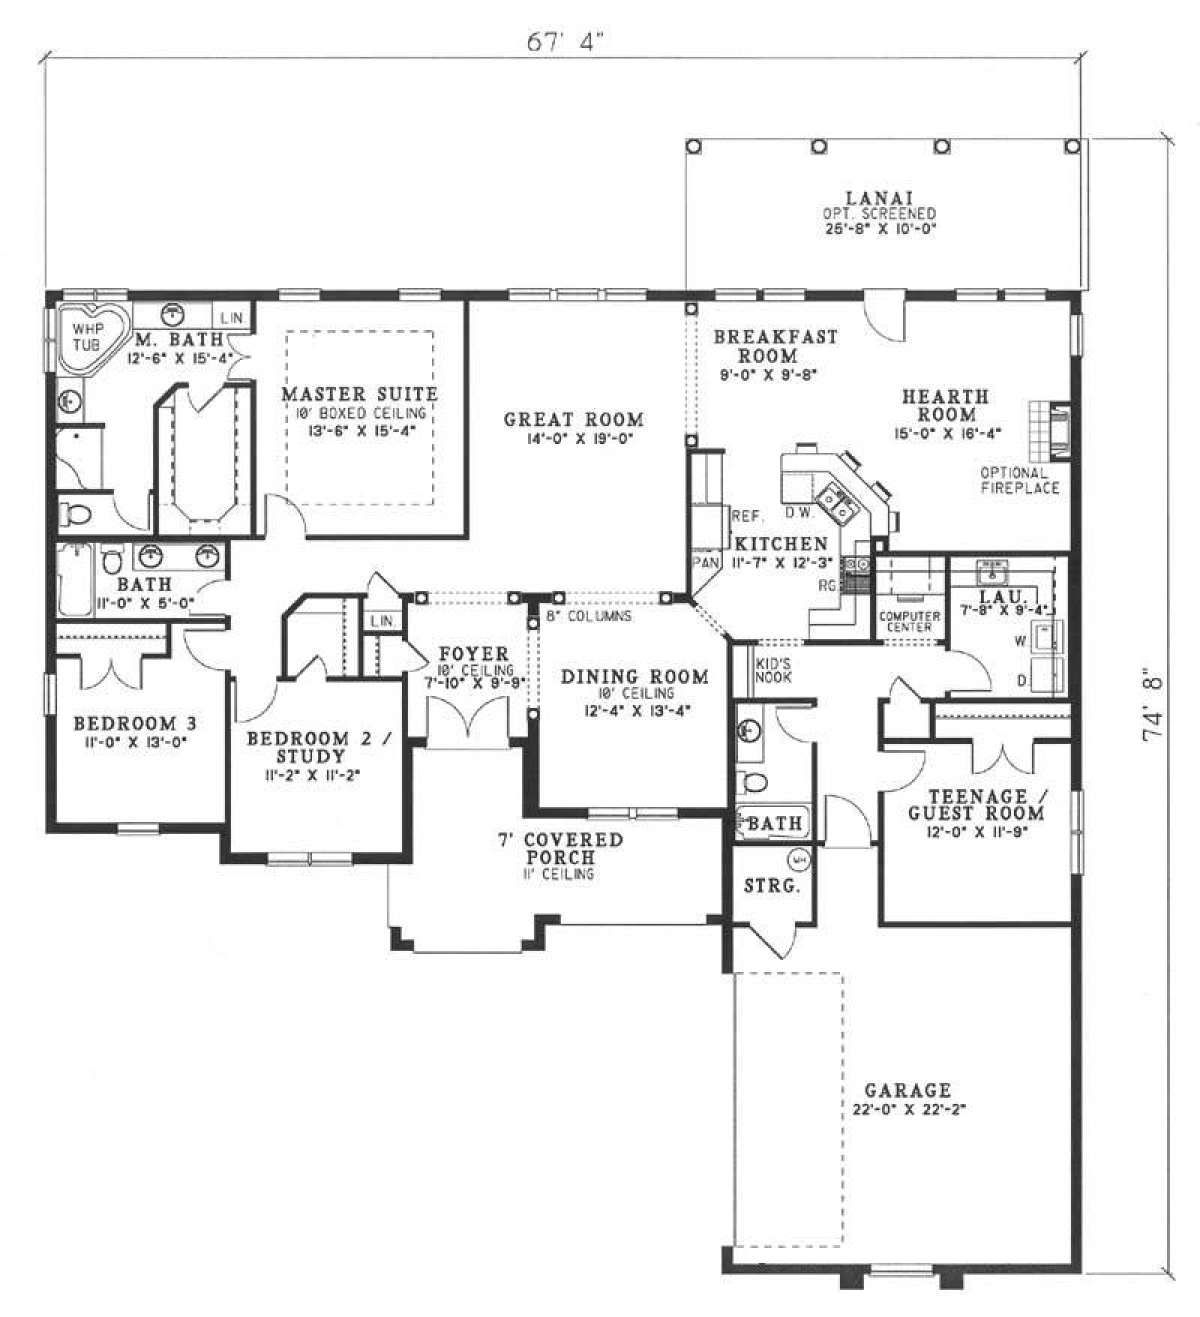 House Plan 110 00413 Florida Plan 2 501 Square Feet 4 Bedrooms 3 Bathrooms In 2020 Traditional House Plans 5 Bedroom House Plans Floor Plans